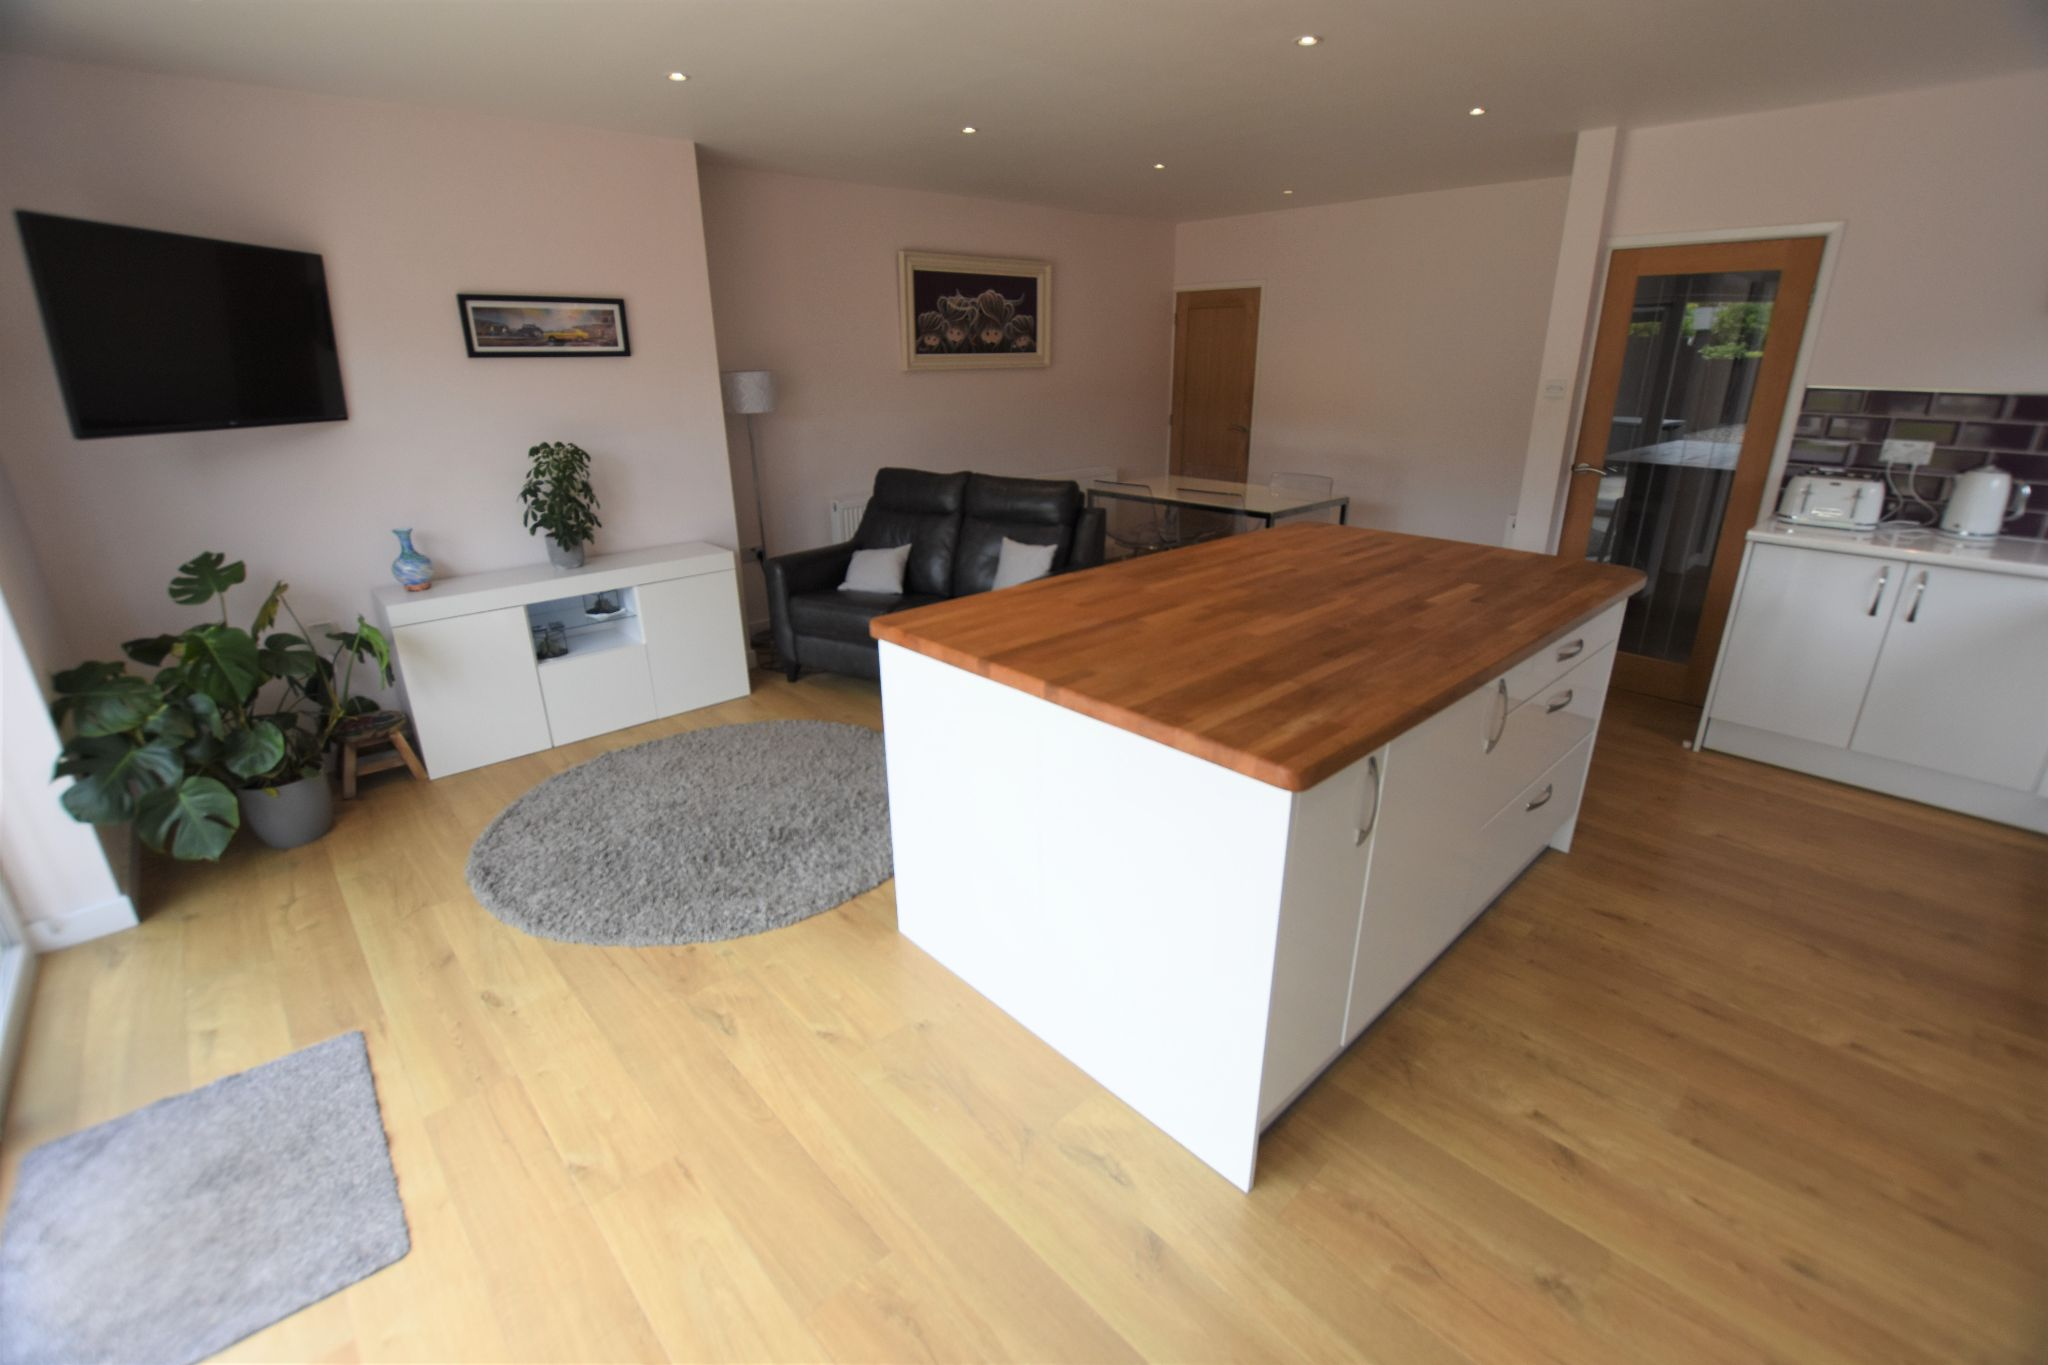 4 bedroom semi-detached bungalow Sold STC in Preston - Kitchen Diner